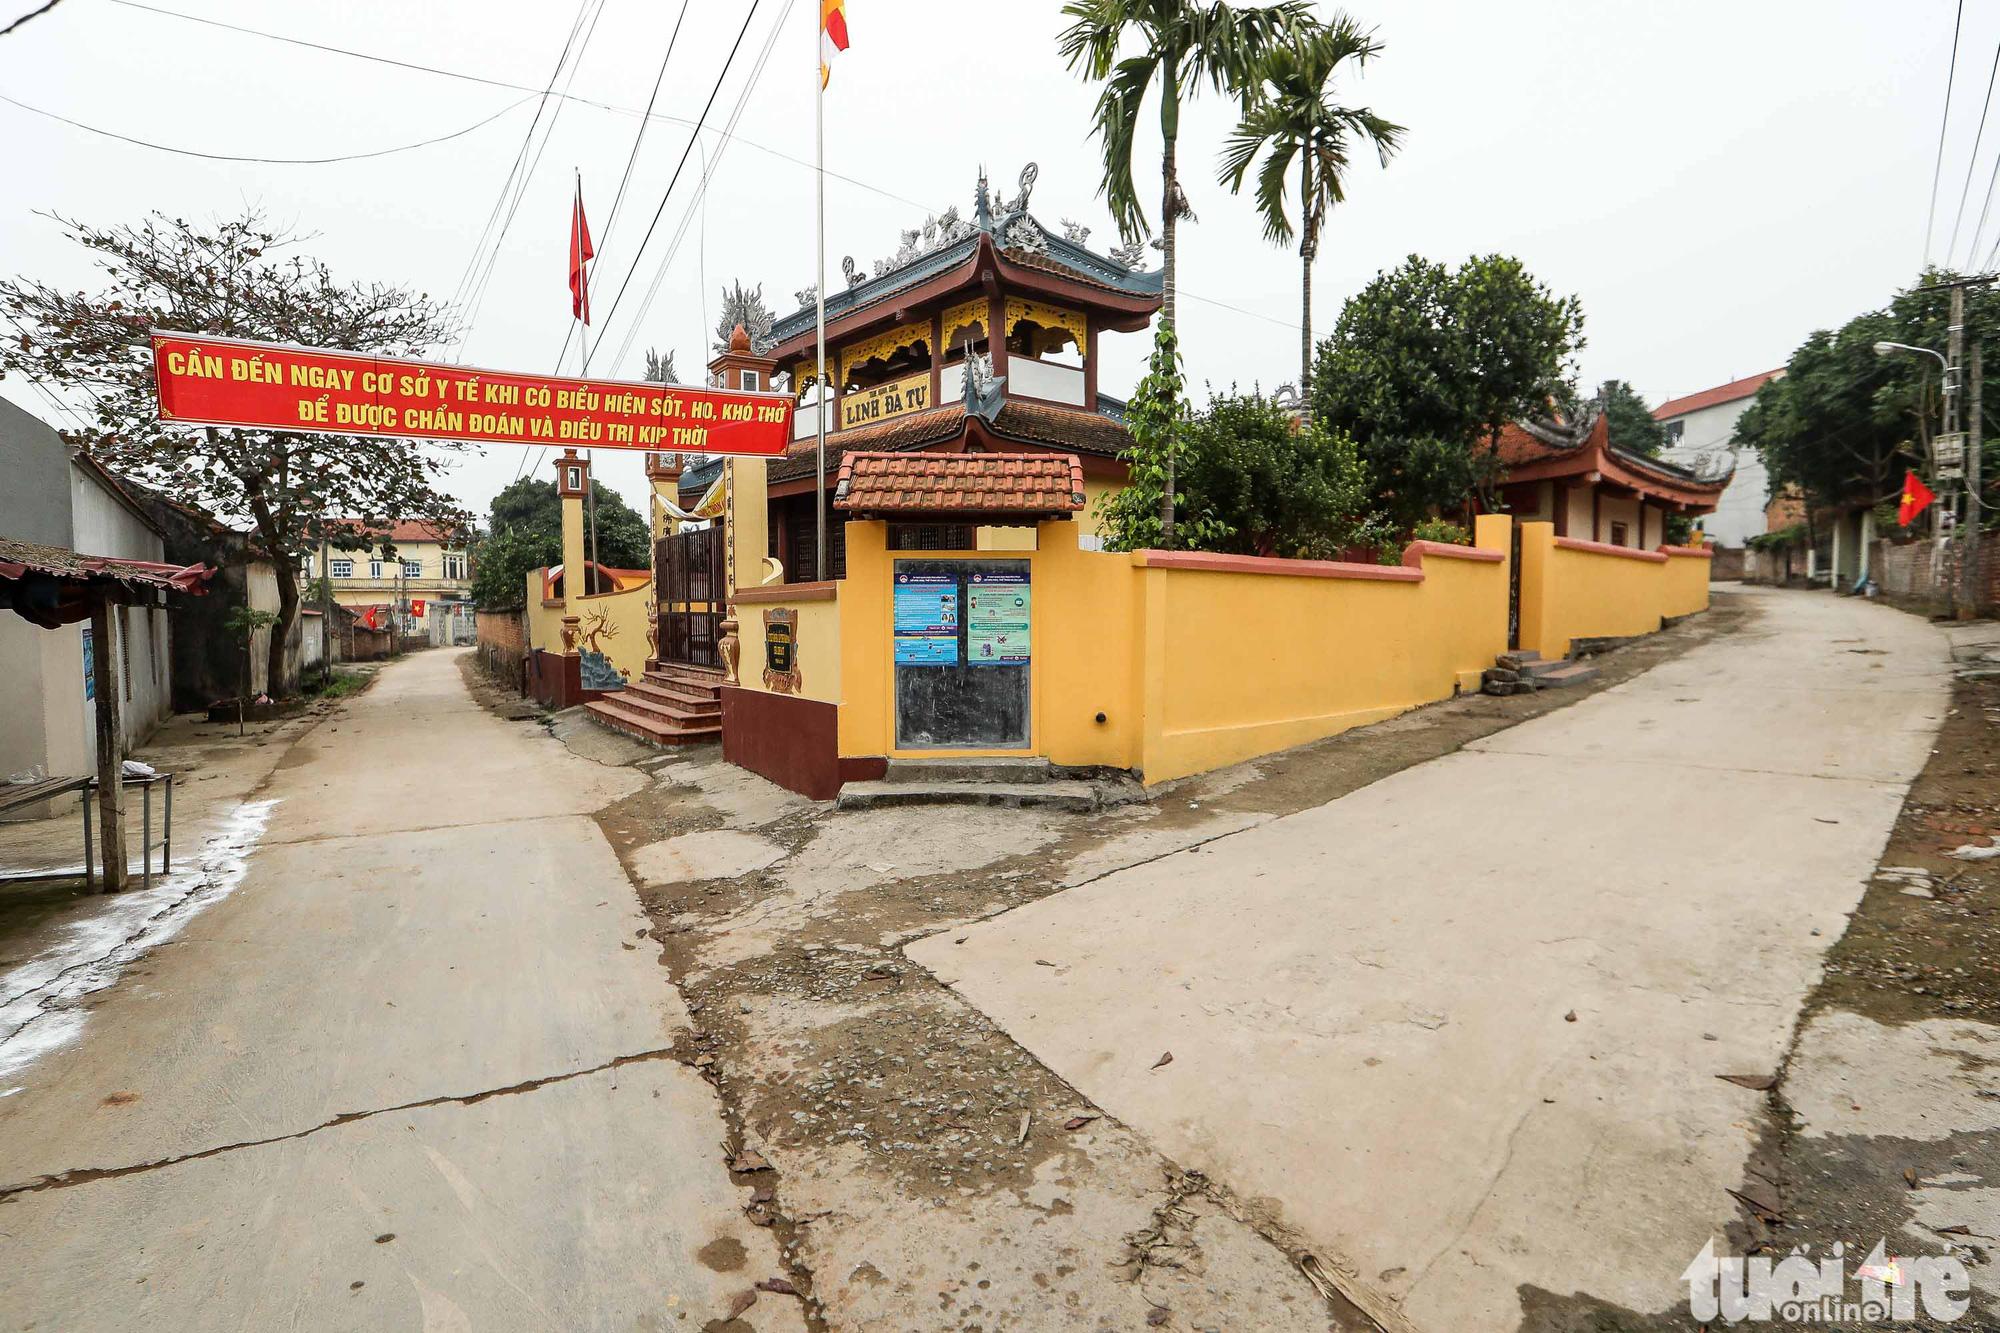 An empty street in Ai Van Village in Son Loi Commune, Binh Xuyen District, Vinh Phuc Province, Vietnam is seen in this photo taken on February 11, 2020. Photo: Nguyen Khanh / Tuoi Tre